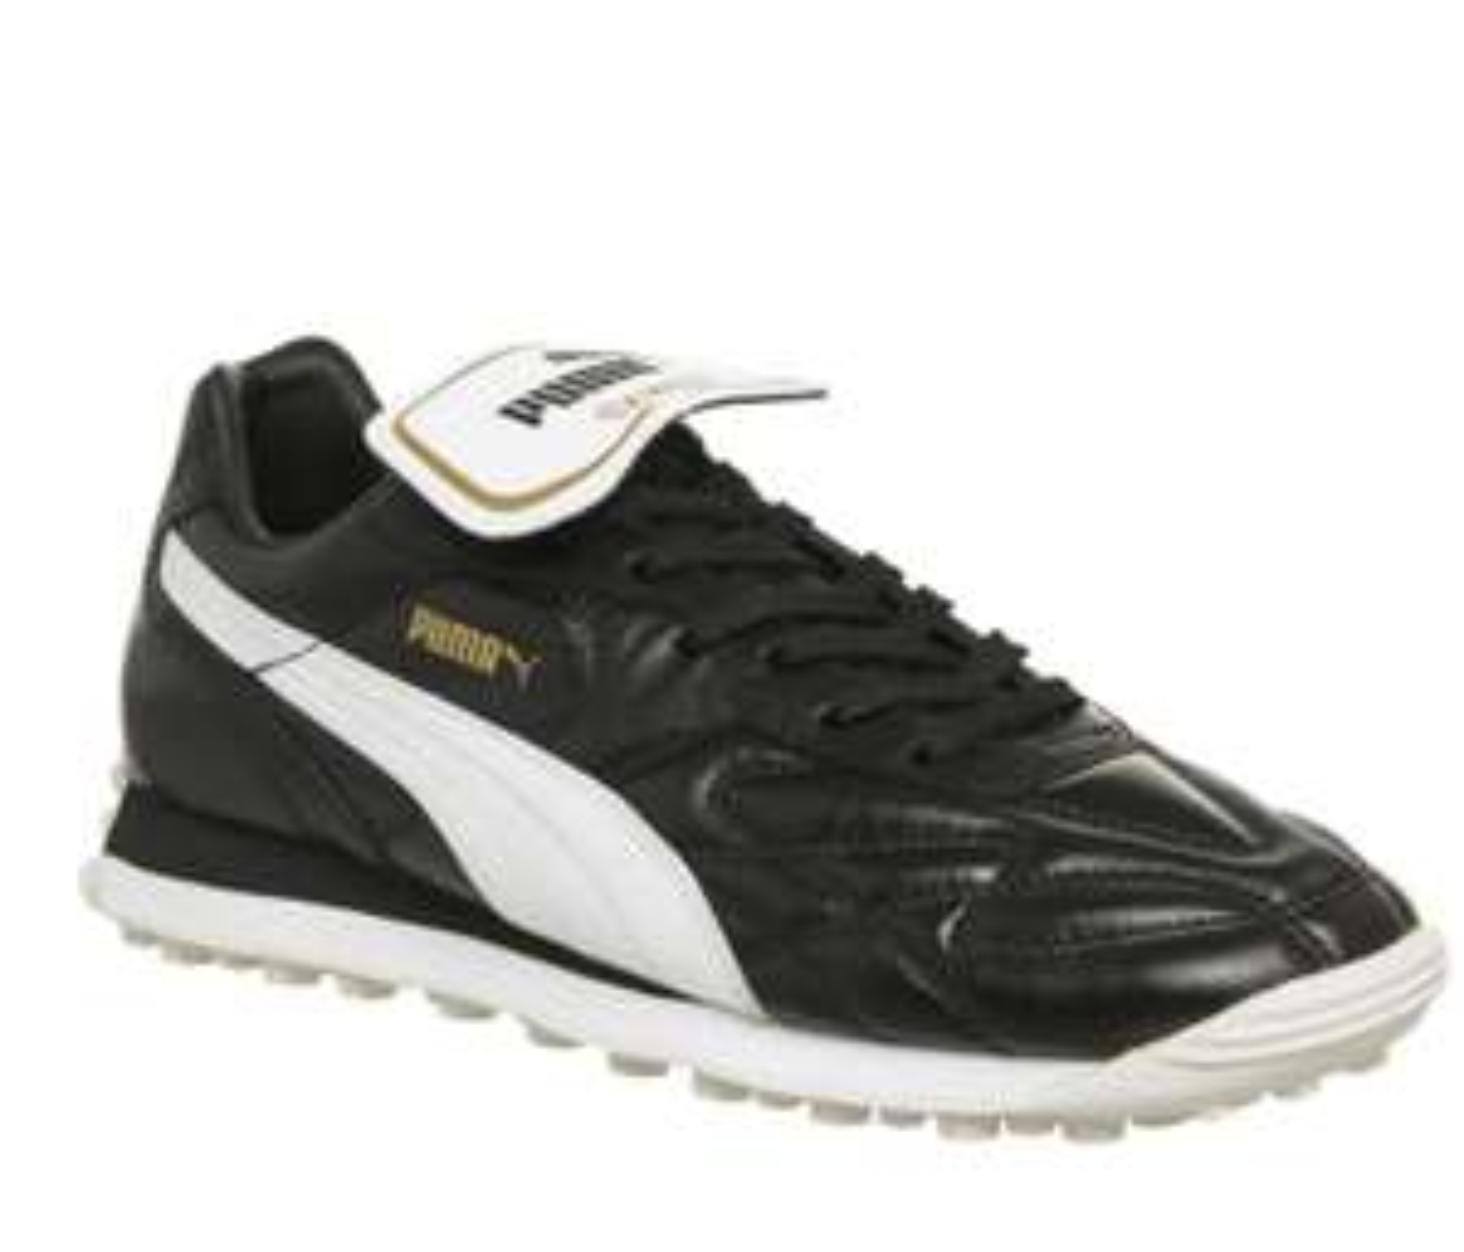 Puma King Avanti Premium Leather Astro turf boot UK 4-12 Black or White £45 @ offspring (free C&C office shoes)